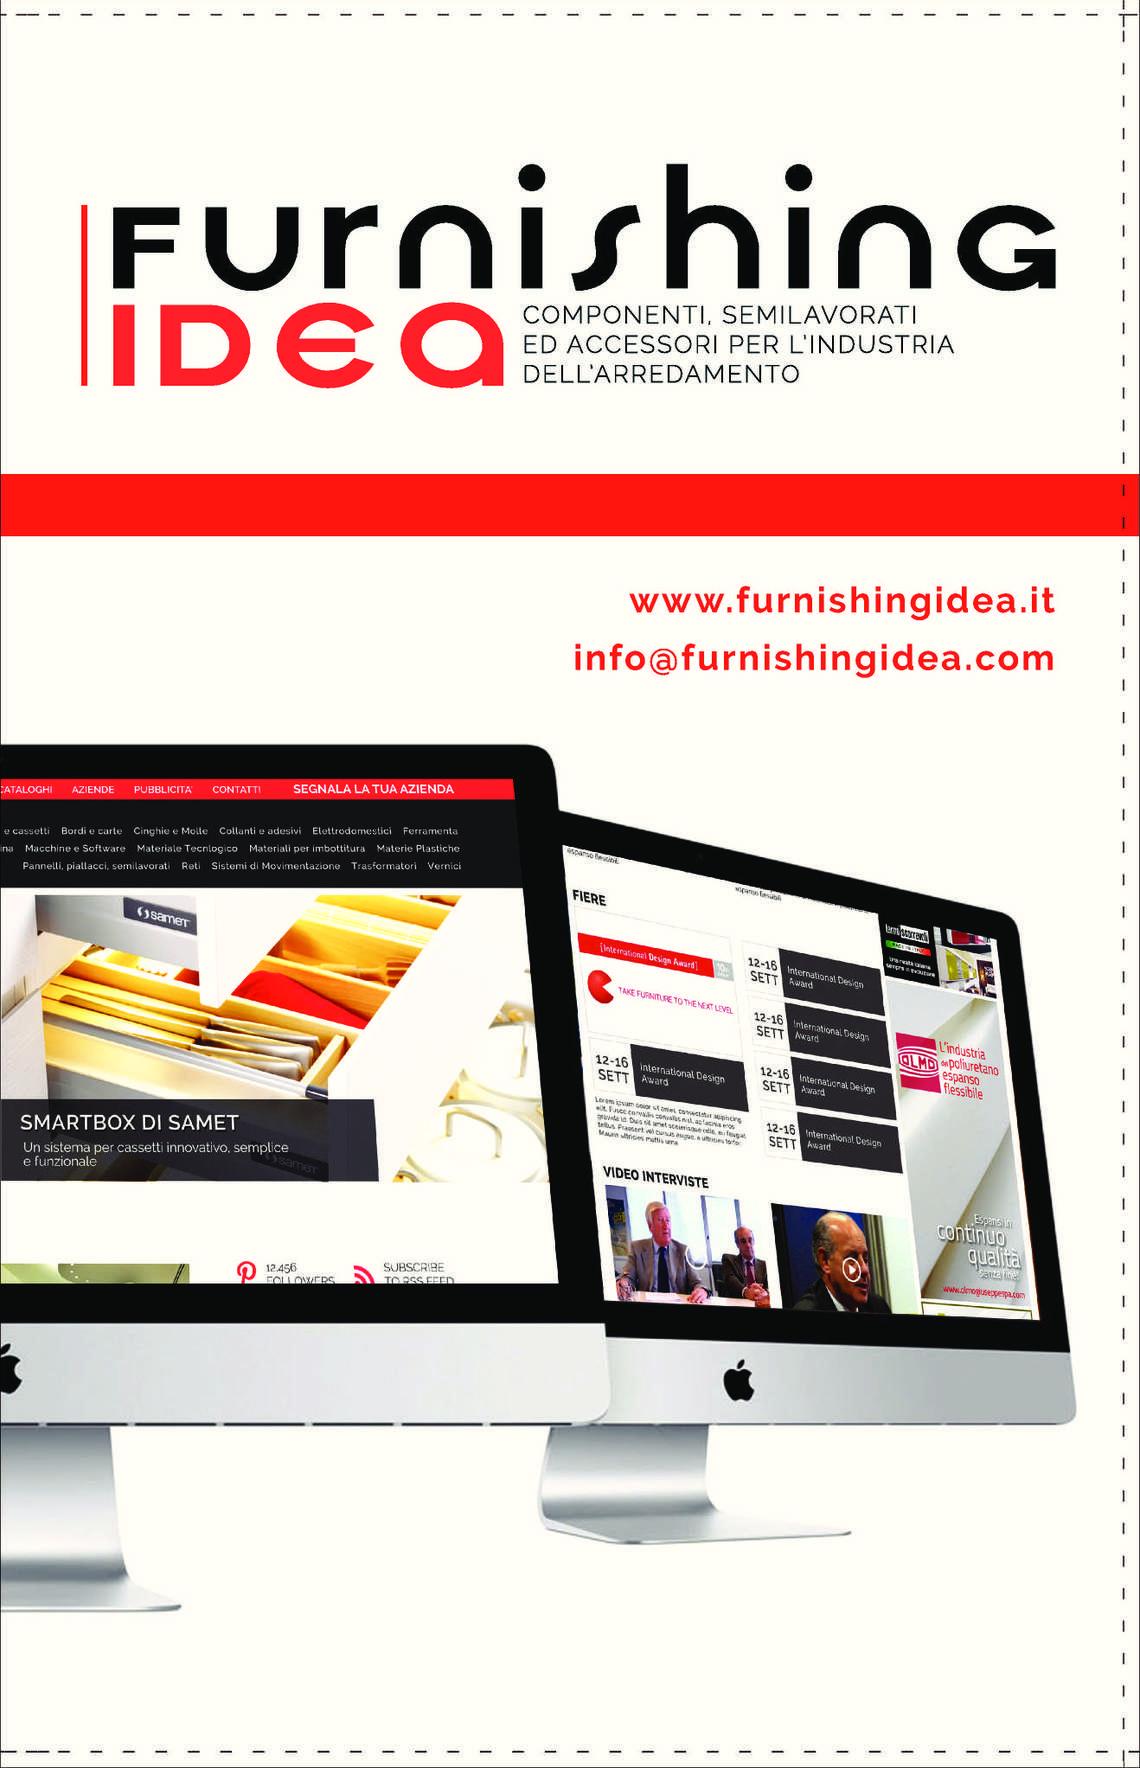 furnishing-idea-journal--1-2018_journal_9_032.jpg